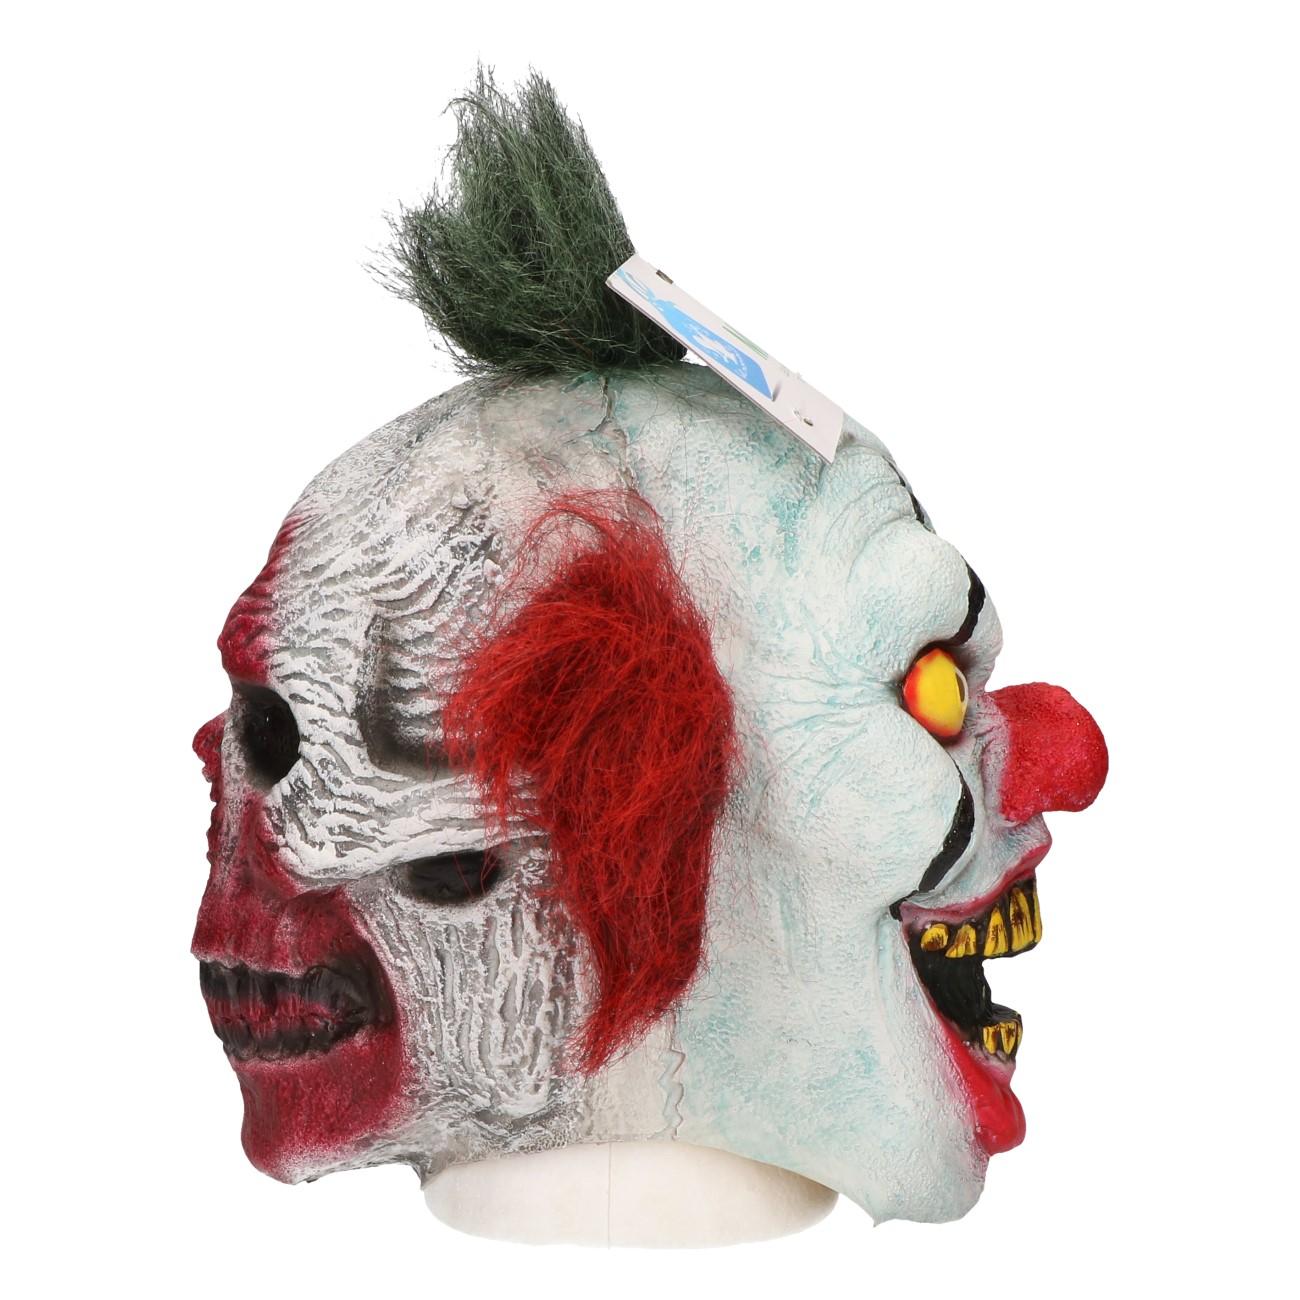 Masker two-face clown #480